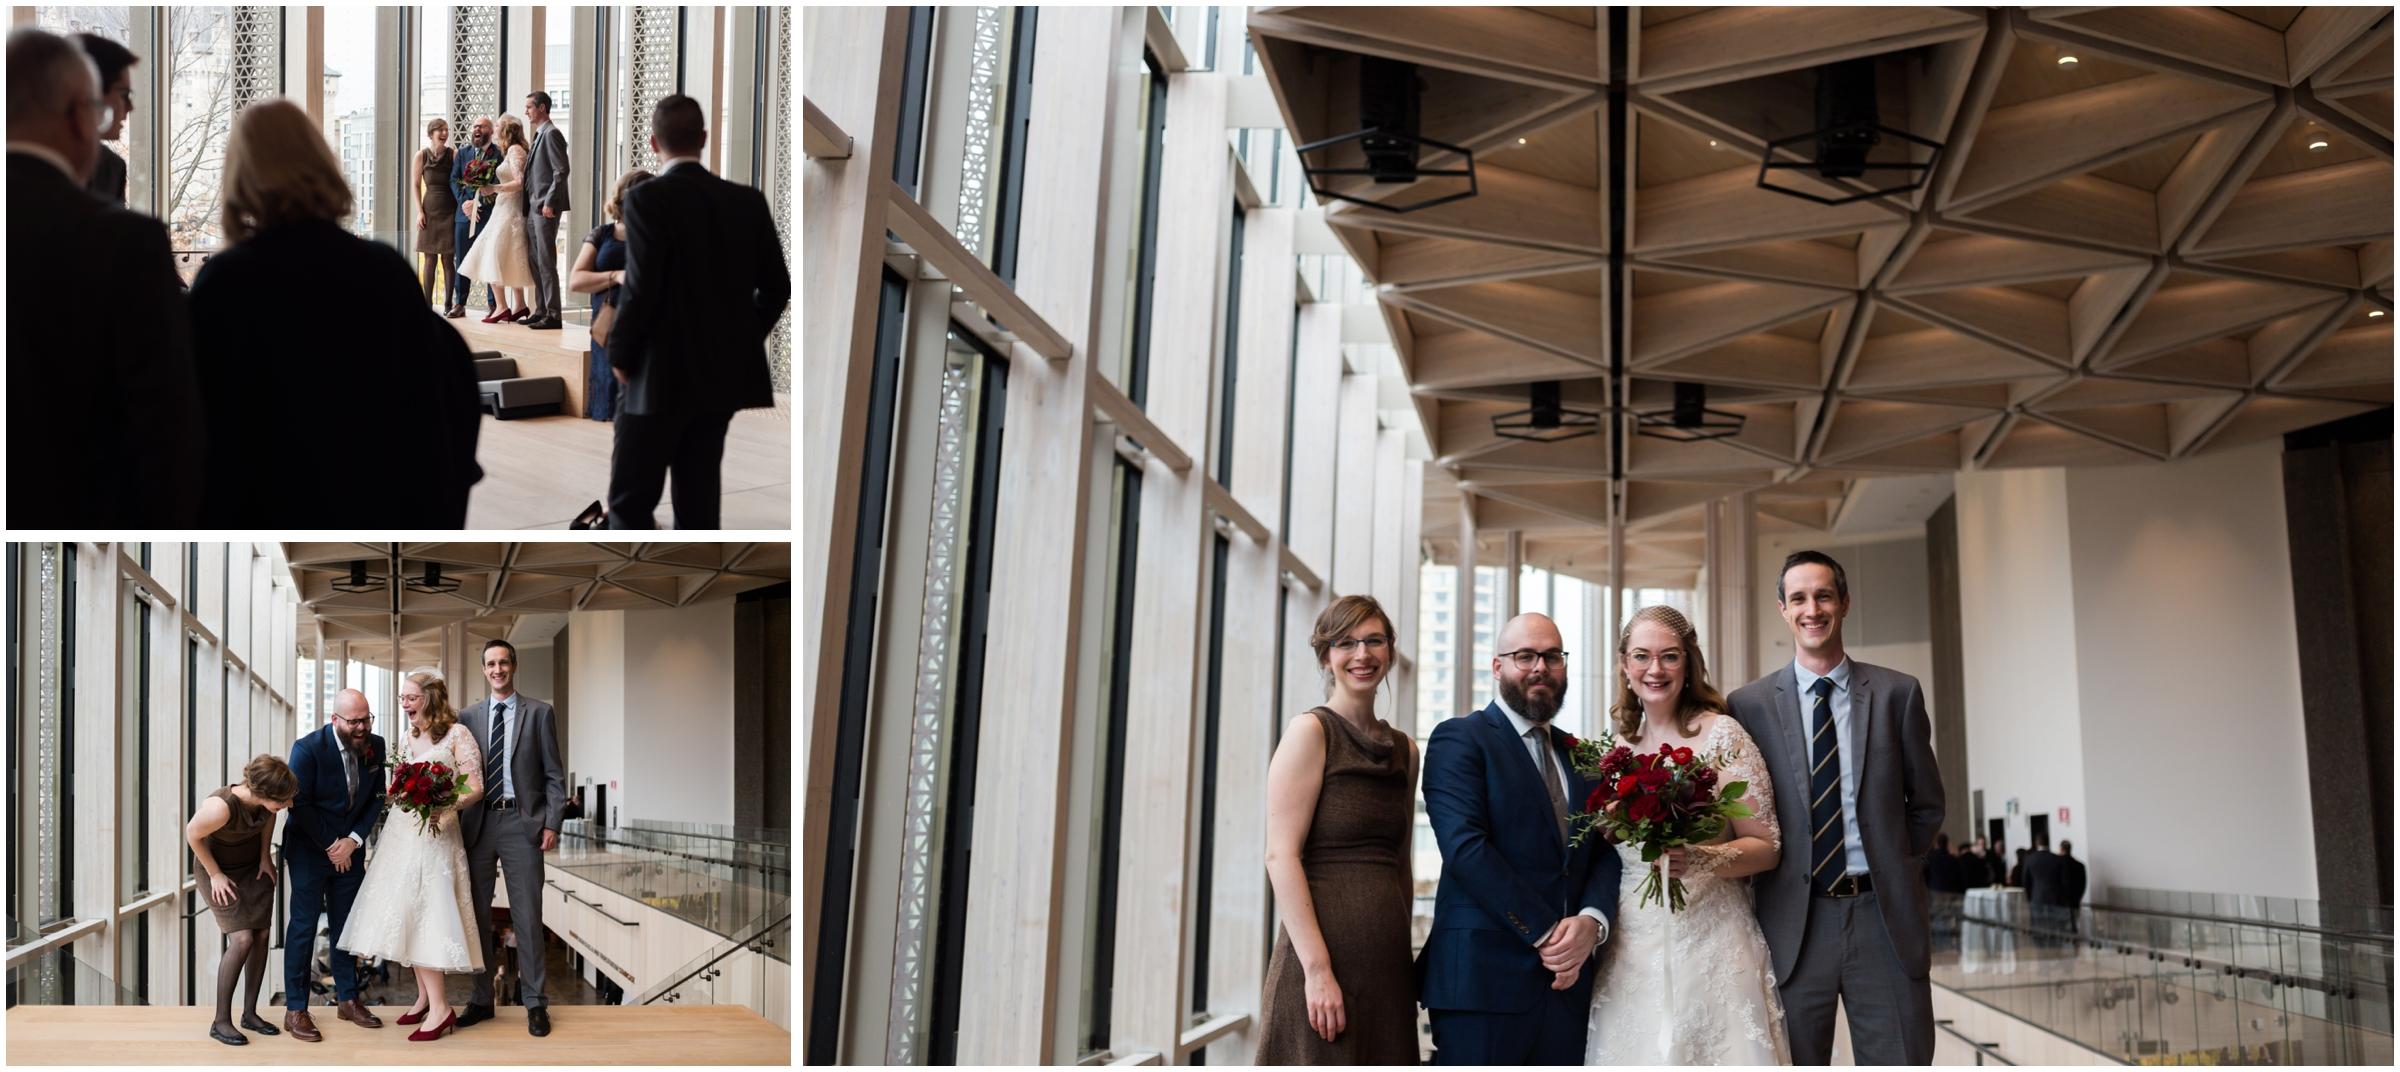 Ottaw Wedding Allison Andrew - (Selena Phillips-Boyle)_0054.jpg